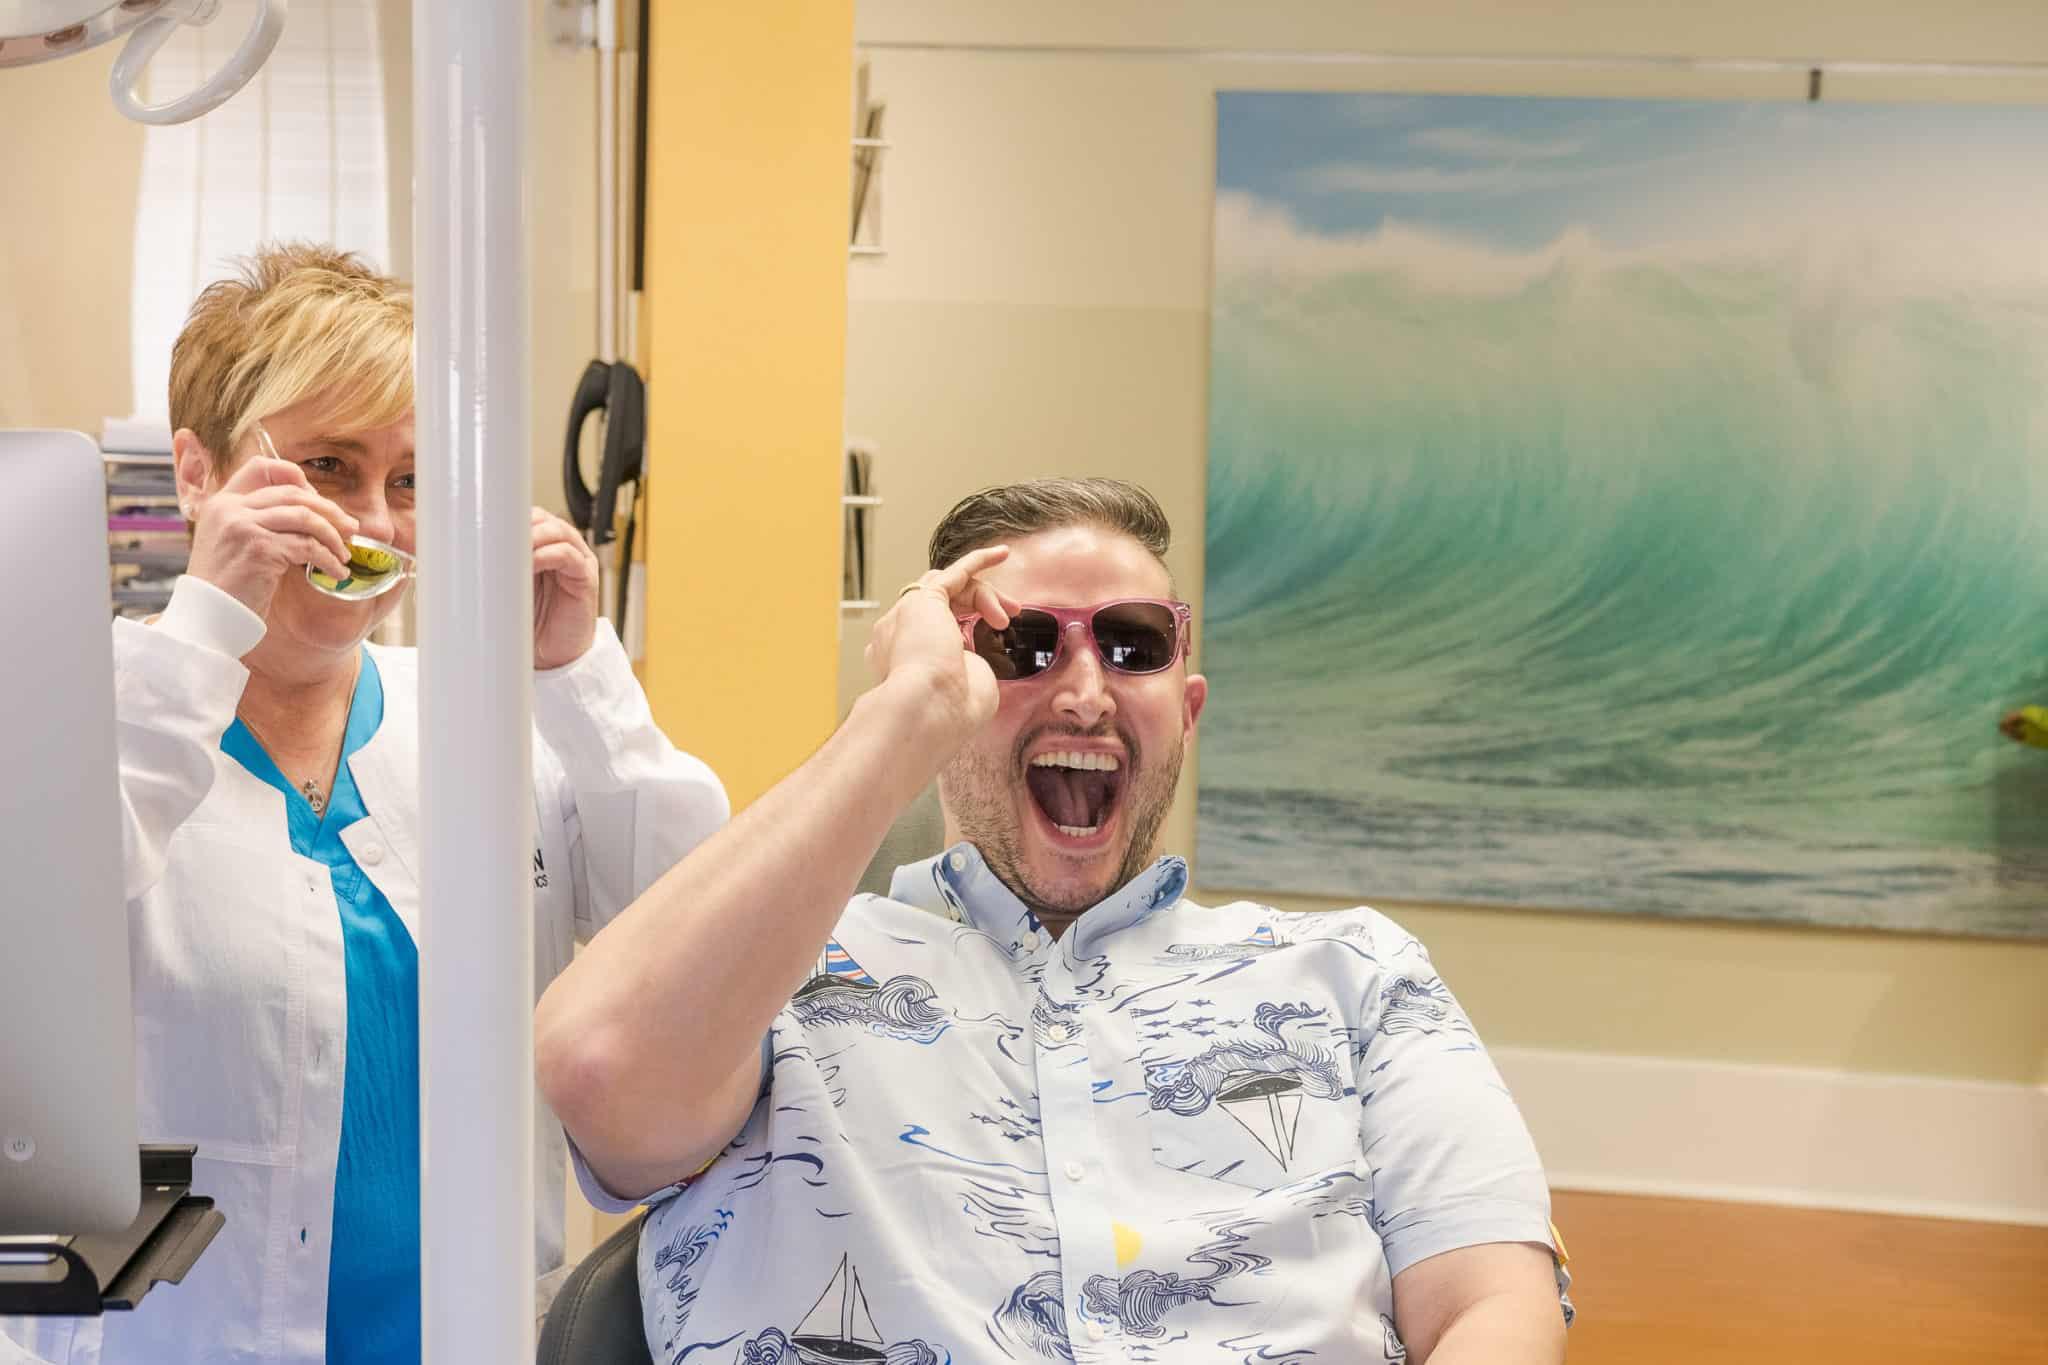 staffandpatient LarsonOrthodontics AlexandriaVA smilesbylarson.com381 2048x1365 - Larson Orthodontics Patient Rewards Program